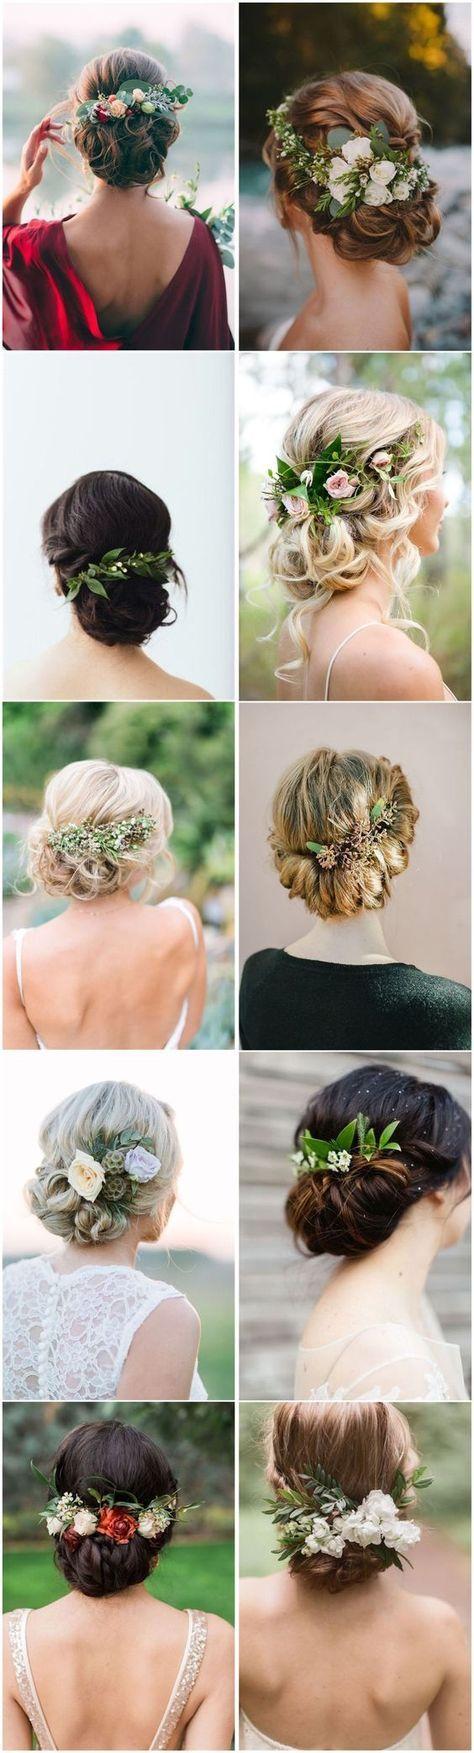 Best 25+ Wedding updo hairstyles ideas on Pinterest | Updo ...